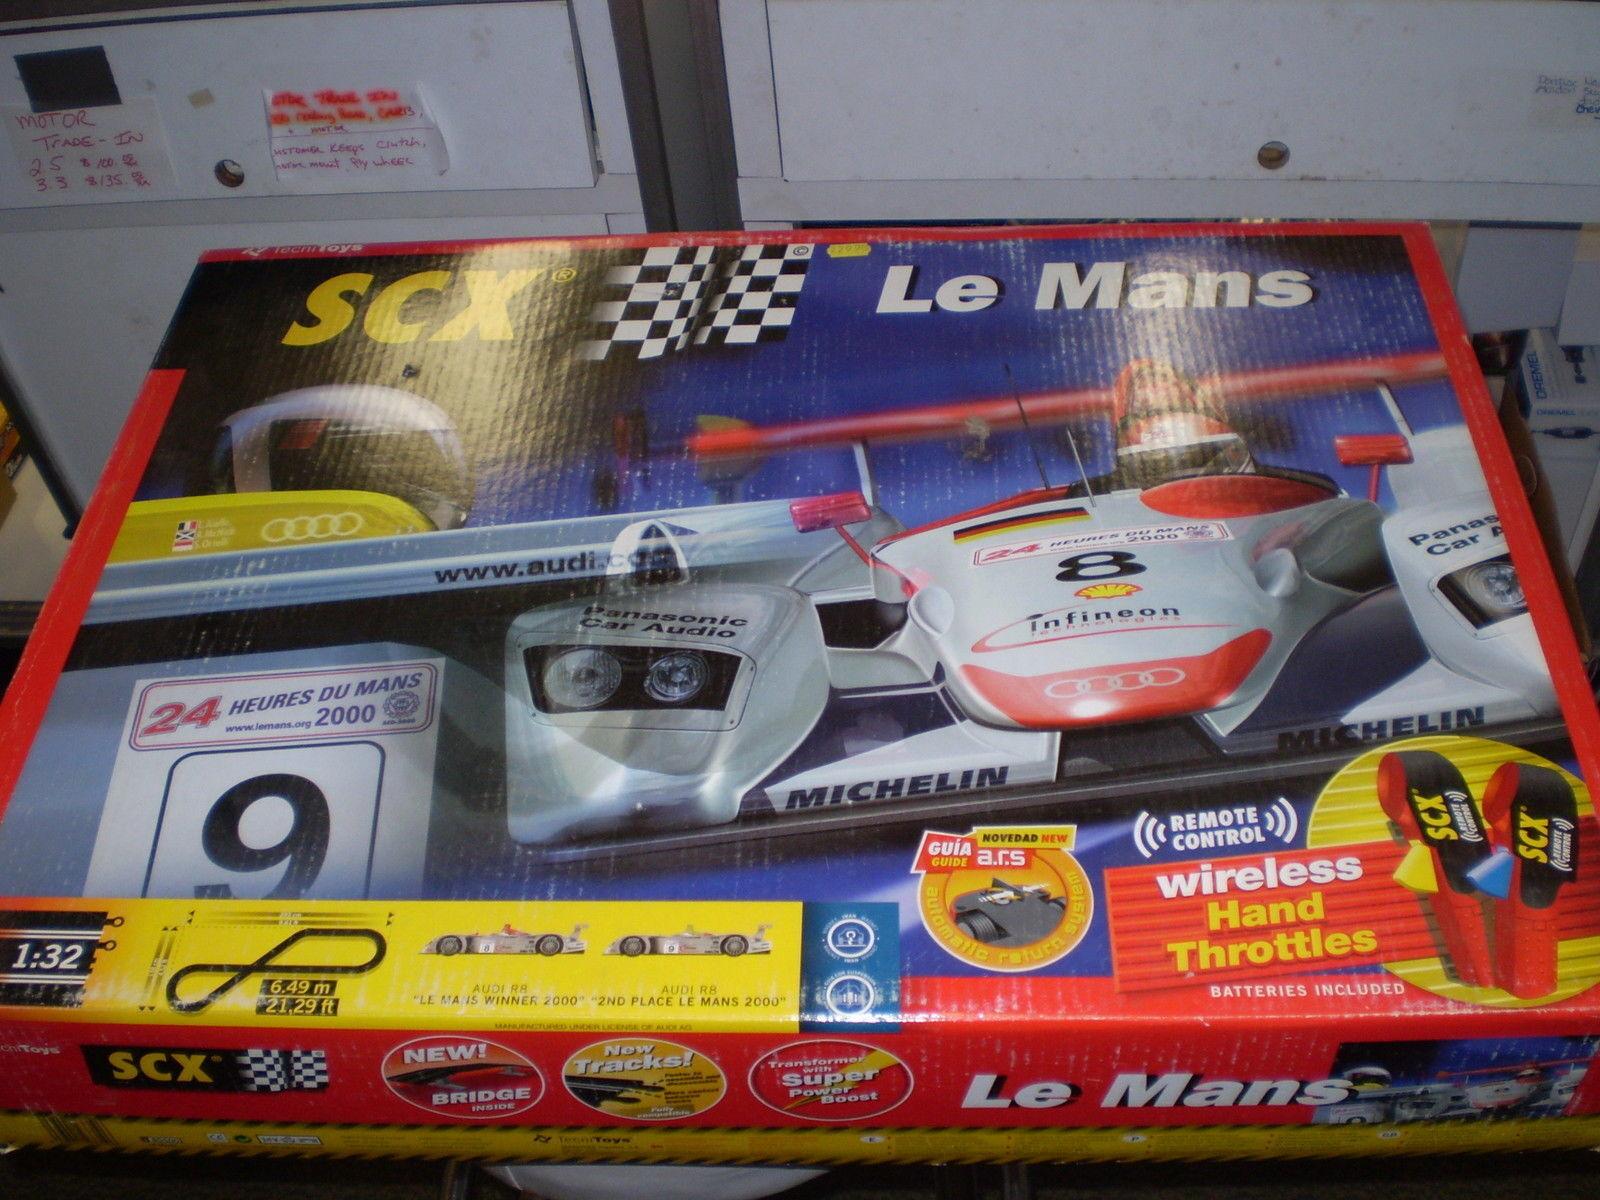 Edición Limitada Mans 1 32 Slot Car Set con Audi R8 2000 Le Mans SCX TECNITOYS SCALEXTRIC NUEVO